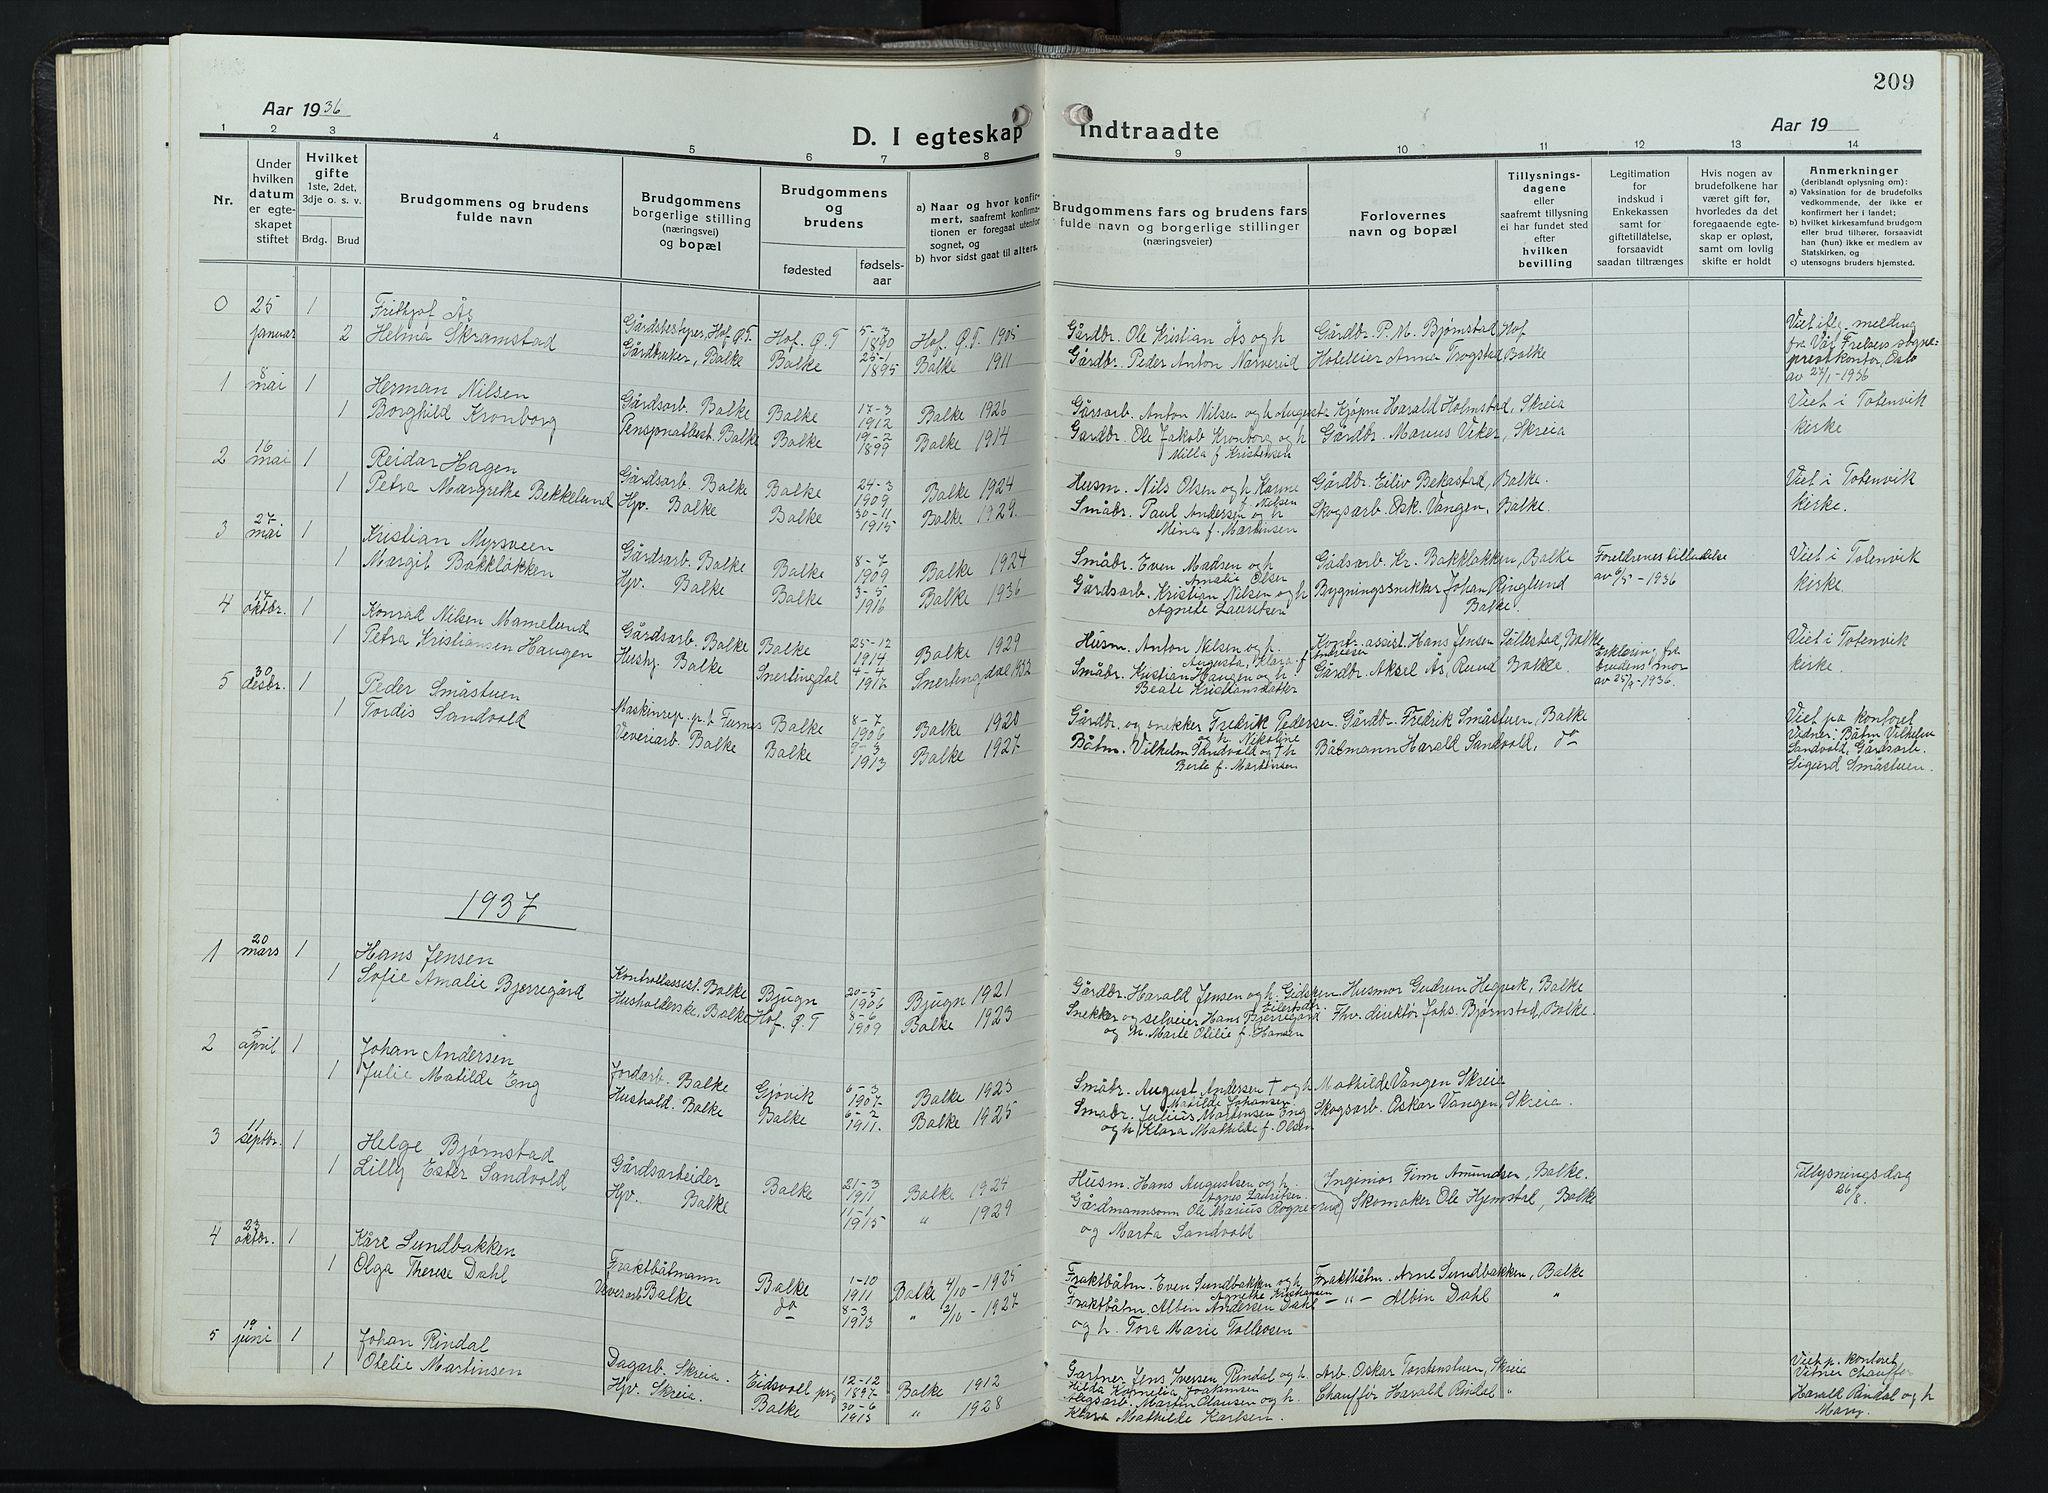 SAH, Balke prestekontor, Klokkerbok nr. 1, 1920-1955, s. 209